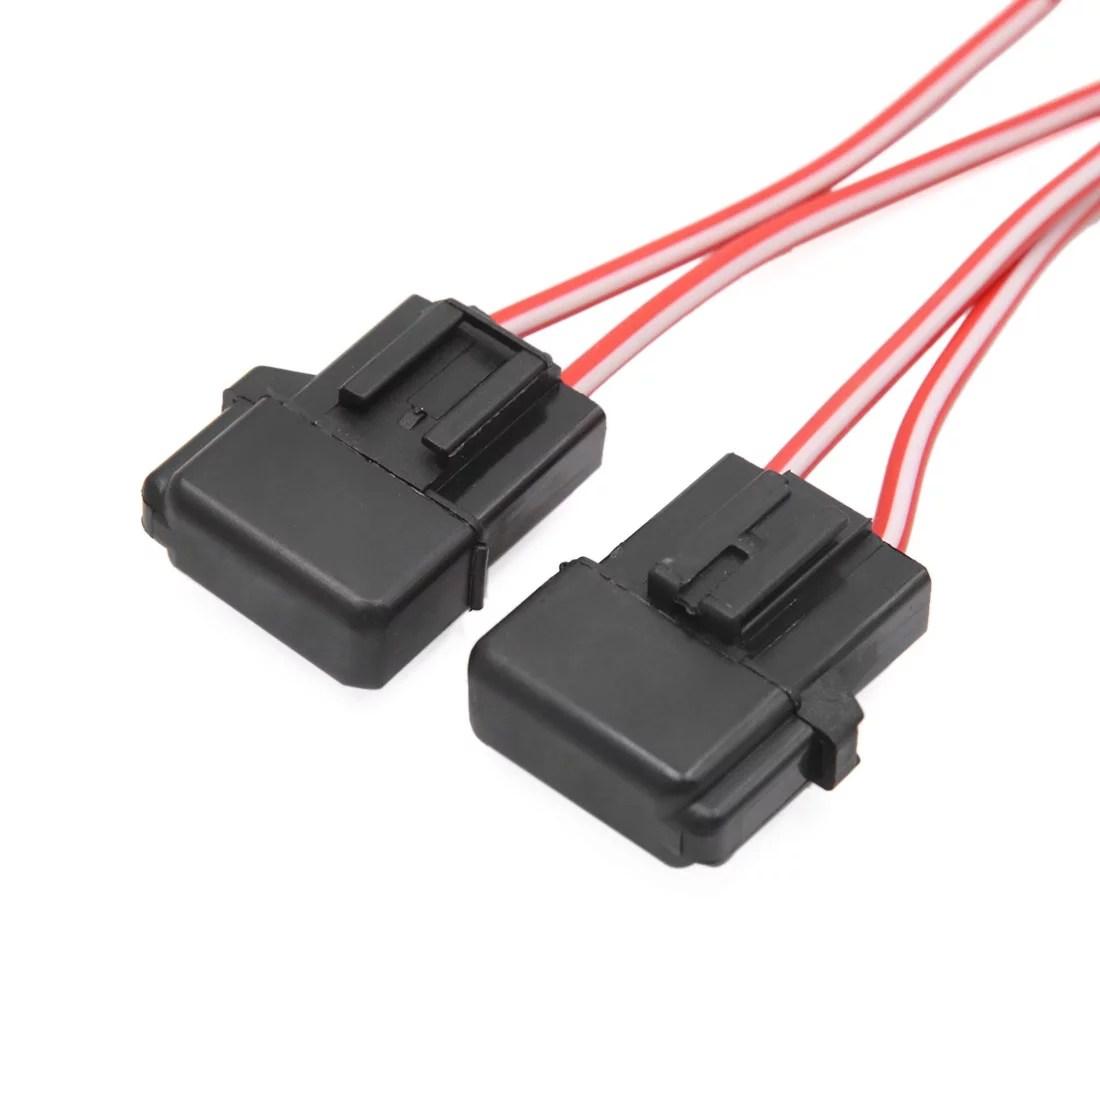 2pcs black plastic square shell cap wiring harness fuse holder for car vehicle walmart canada [ 1100 x 1100 Pixel ]